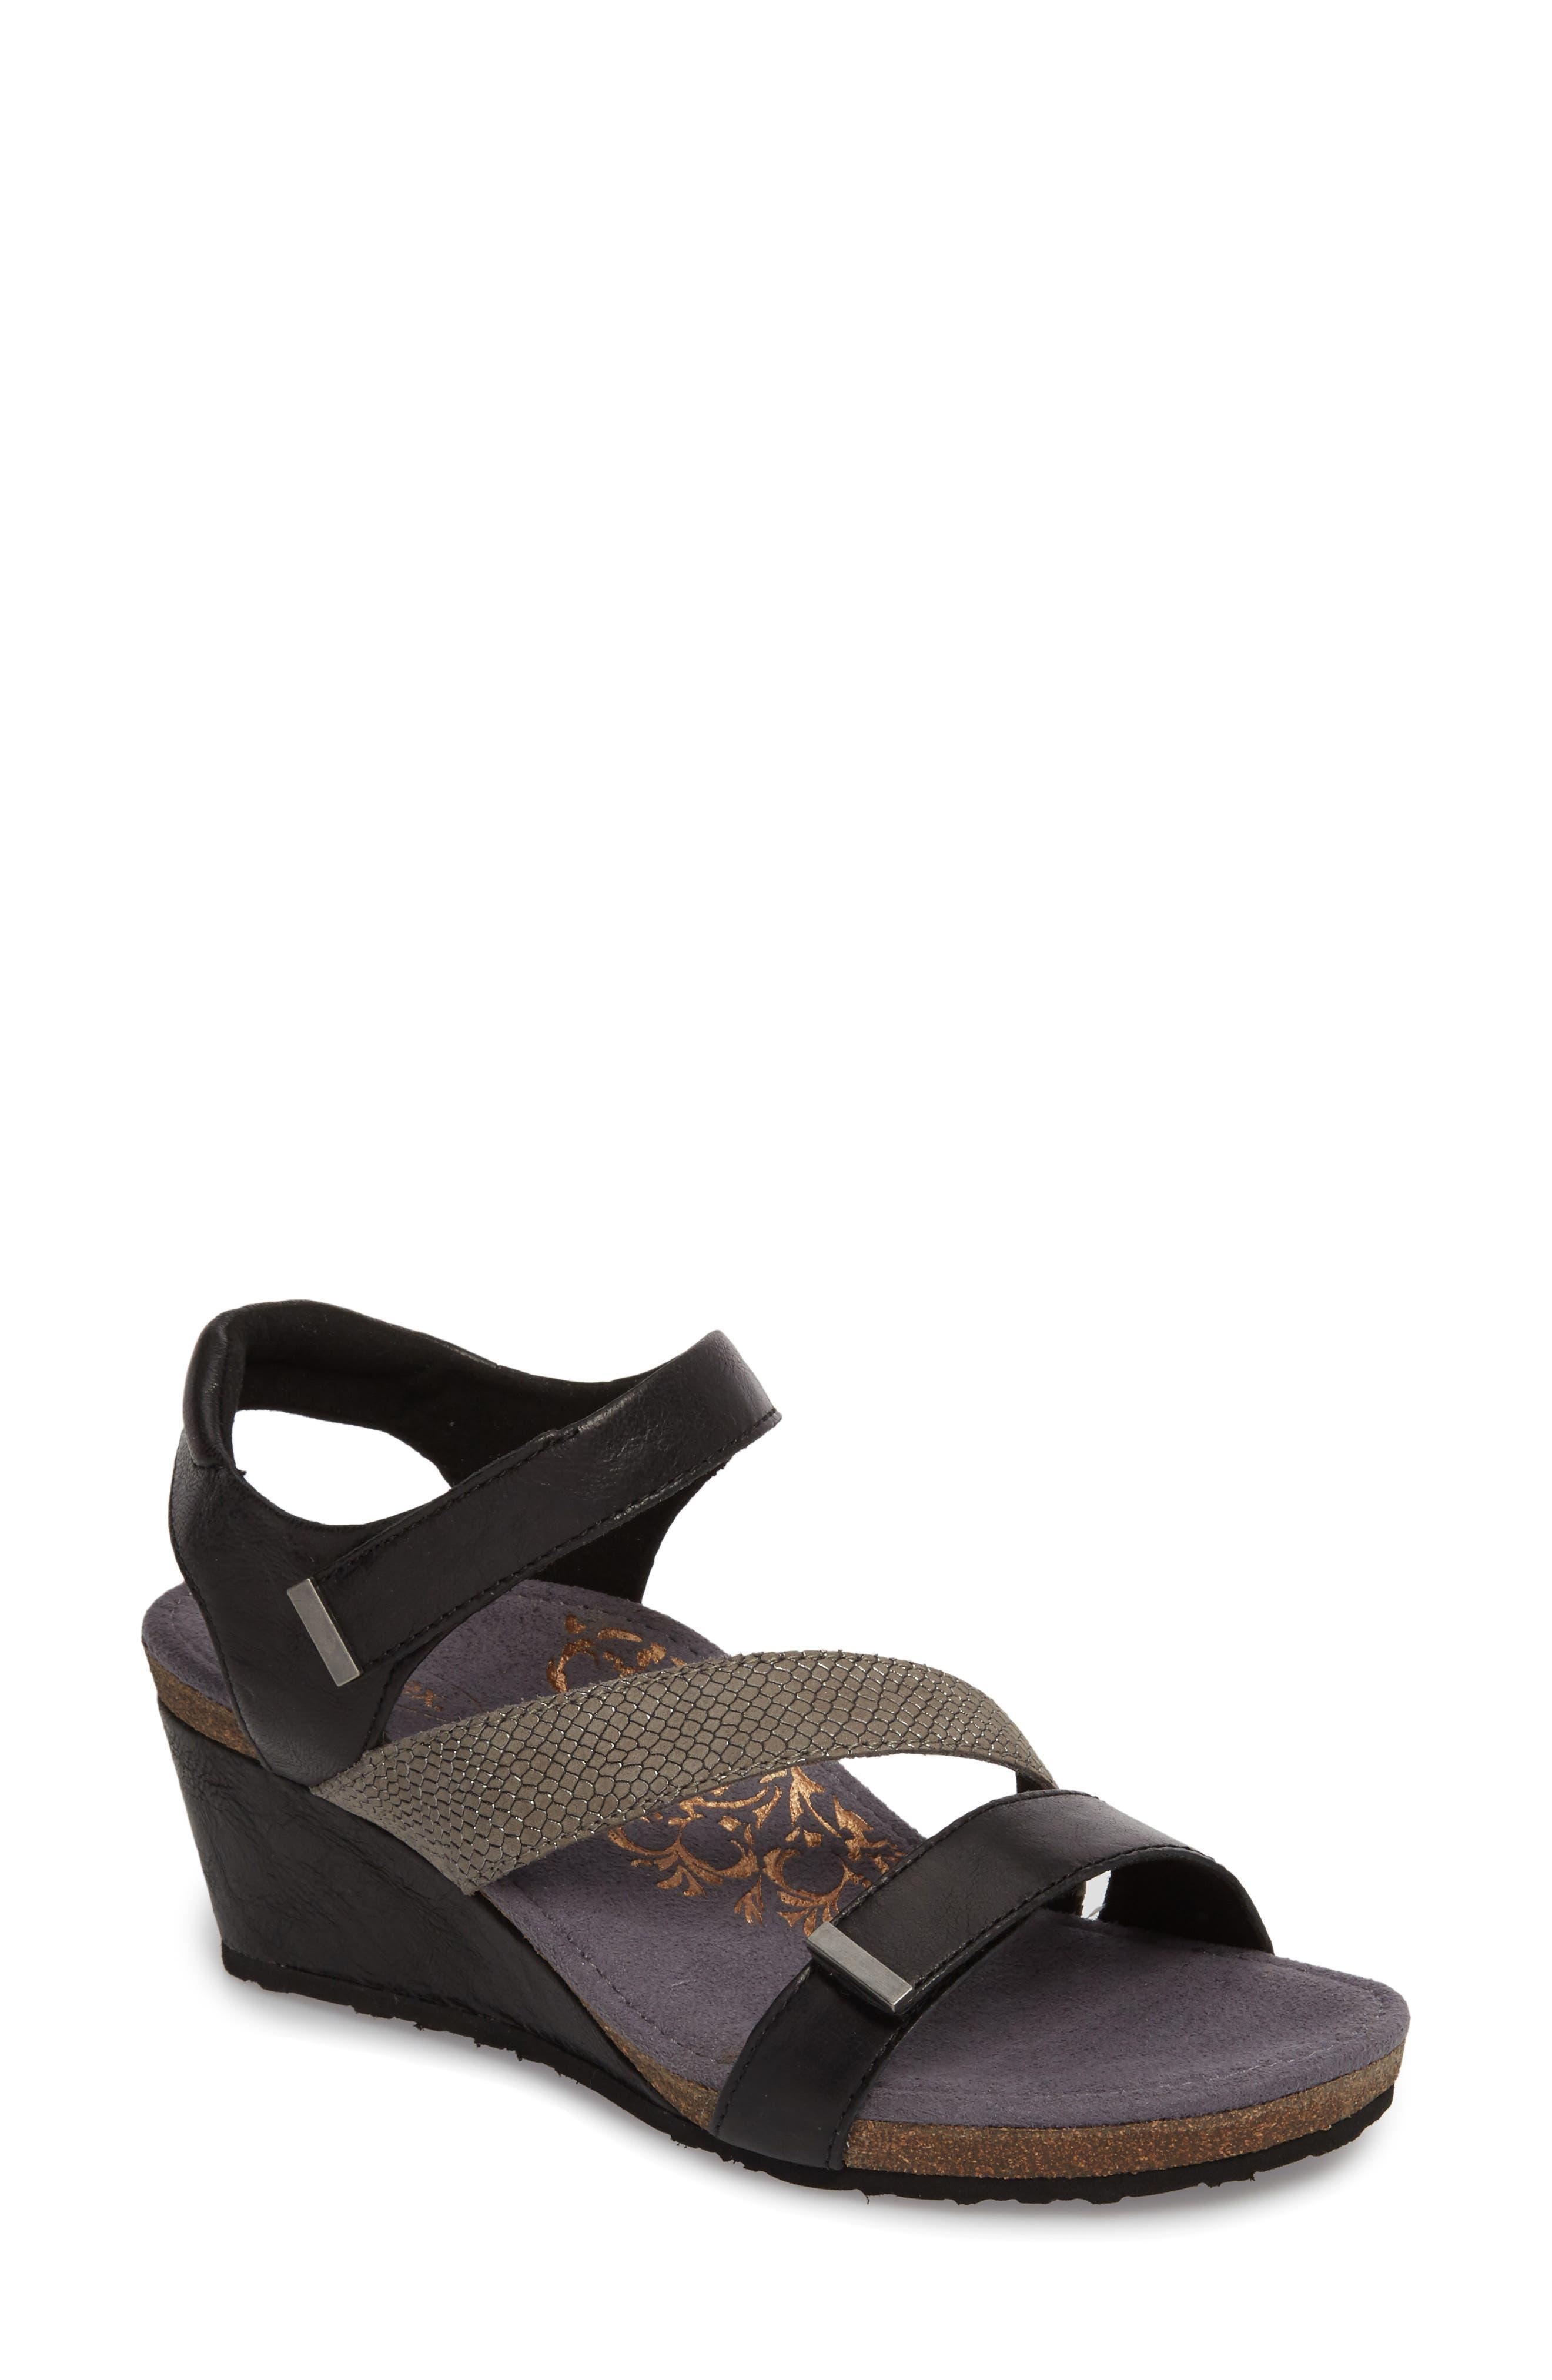 Brynn Asymmetrical Wedge Sandal,                         Main,                         color, Black Leather